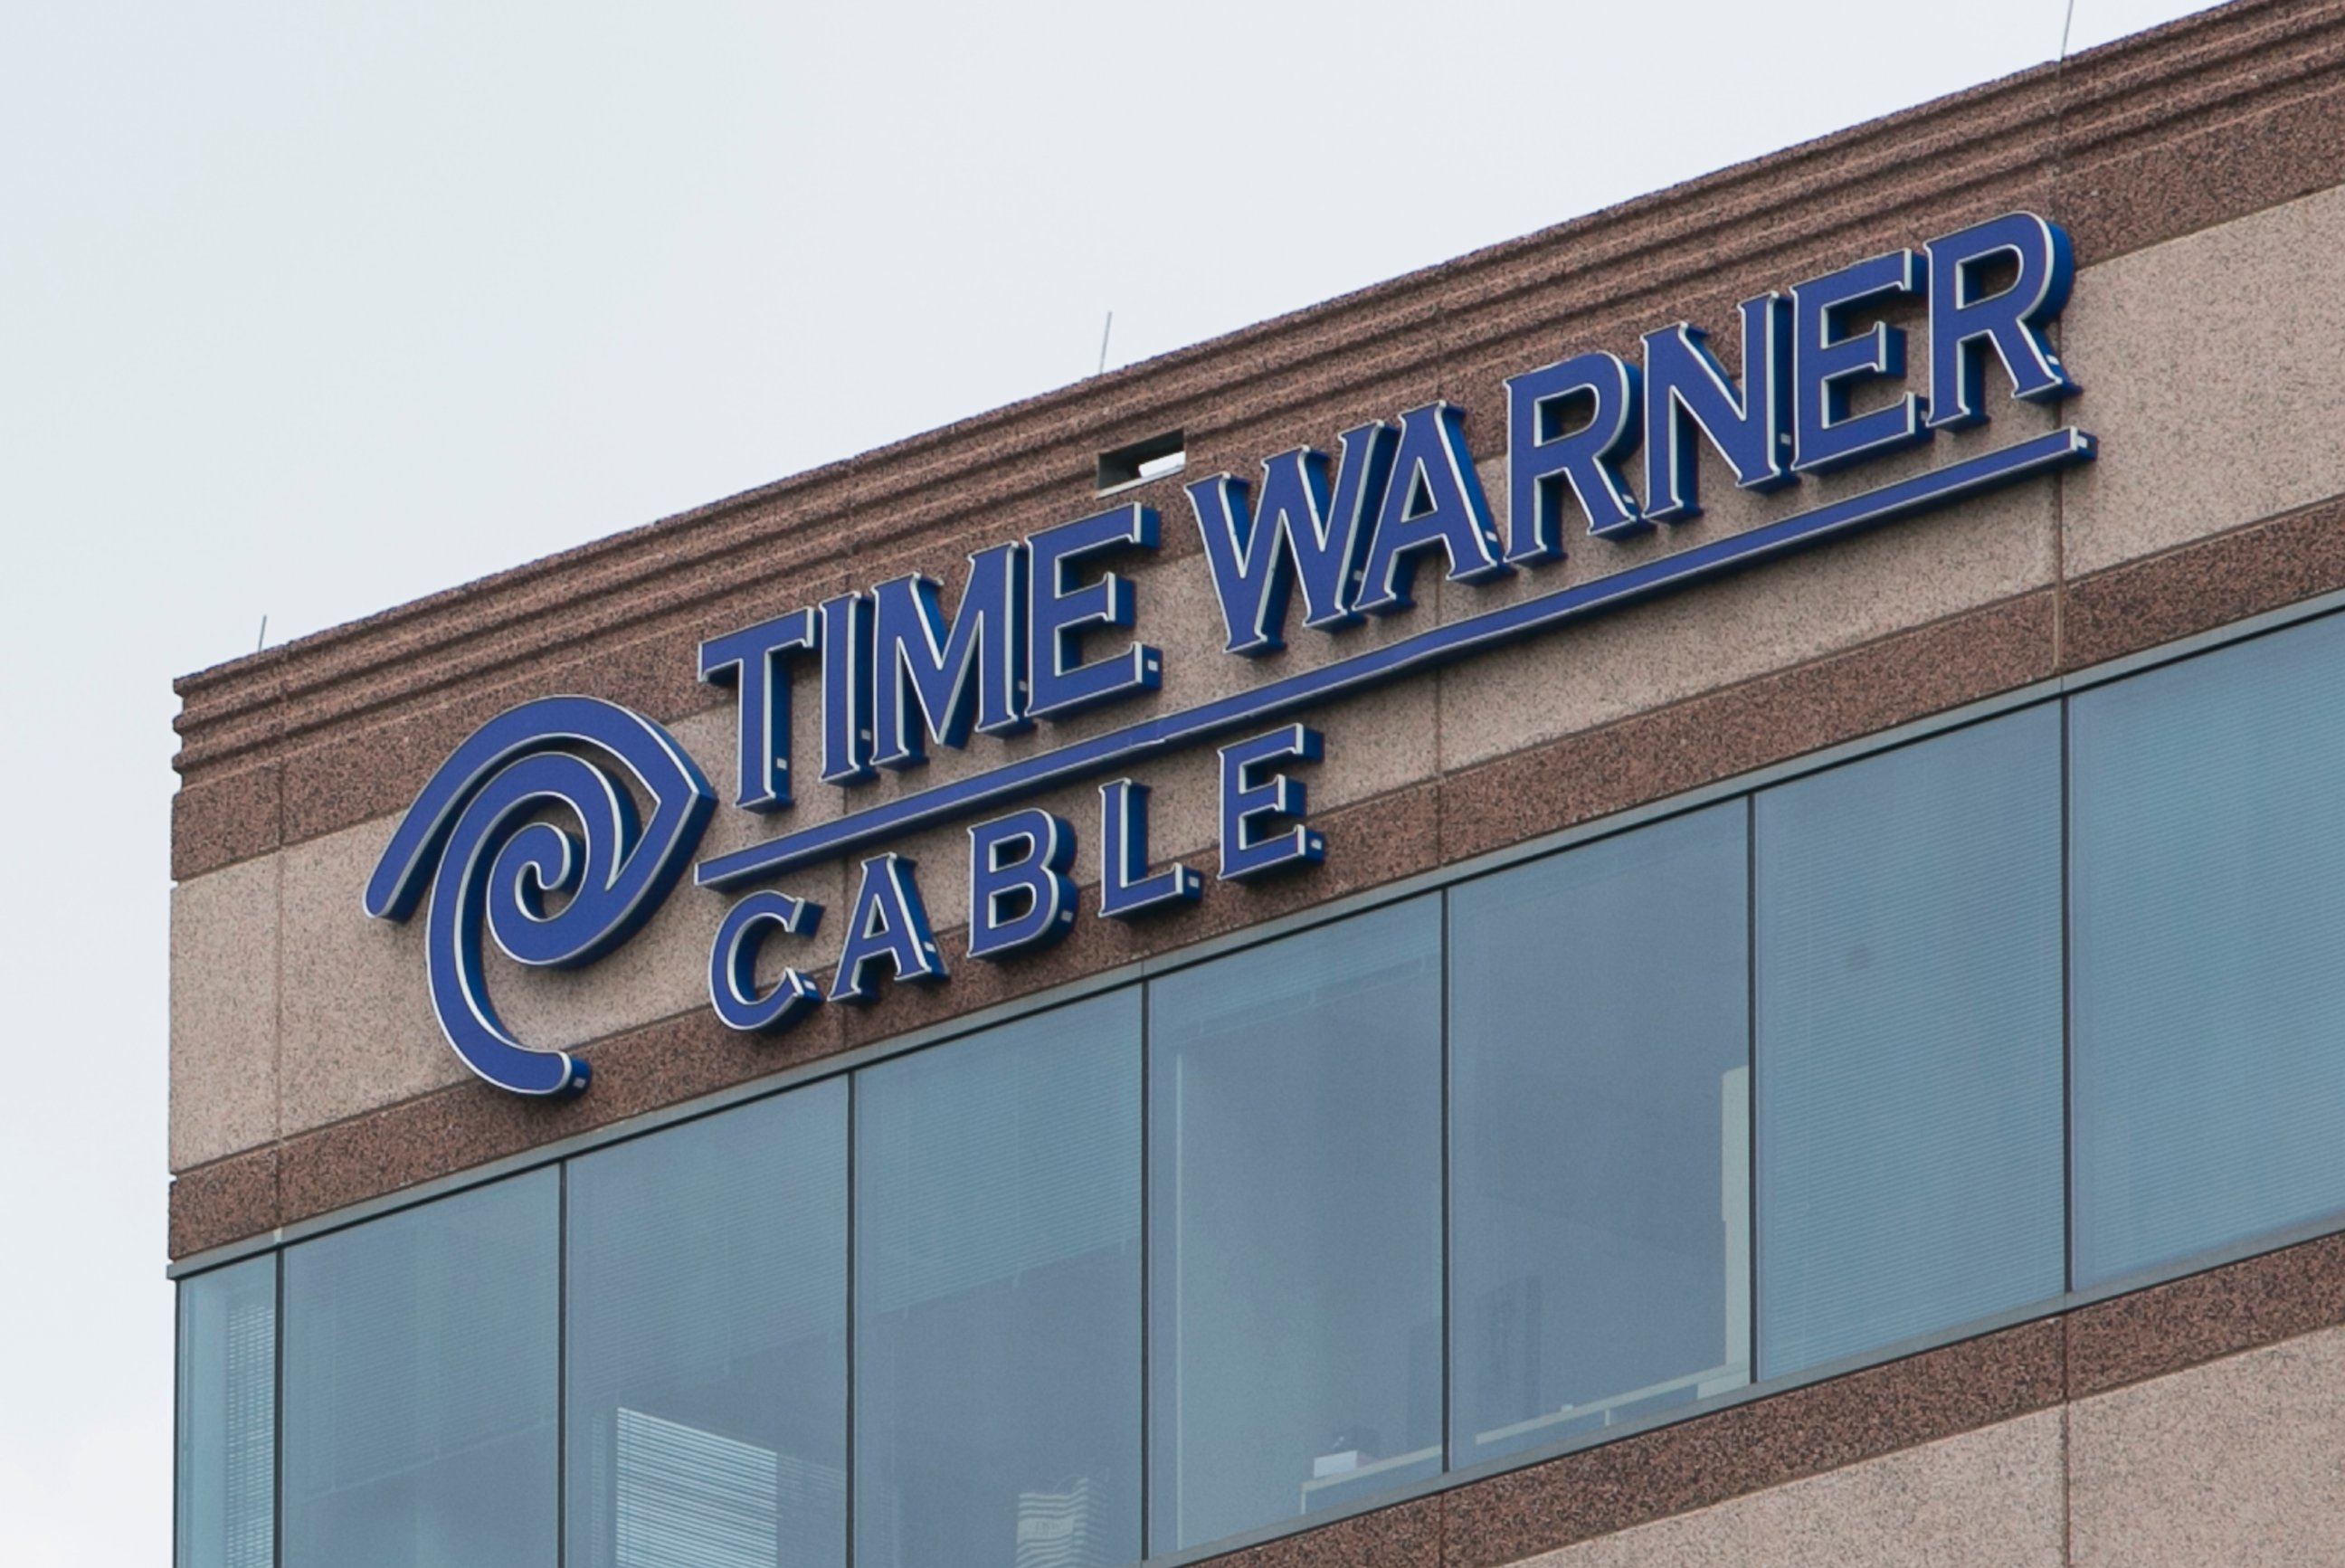 Time Warner Cable Garden City South Carolina – Garden Ftempo Time Warner Cable